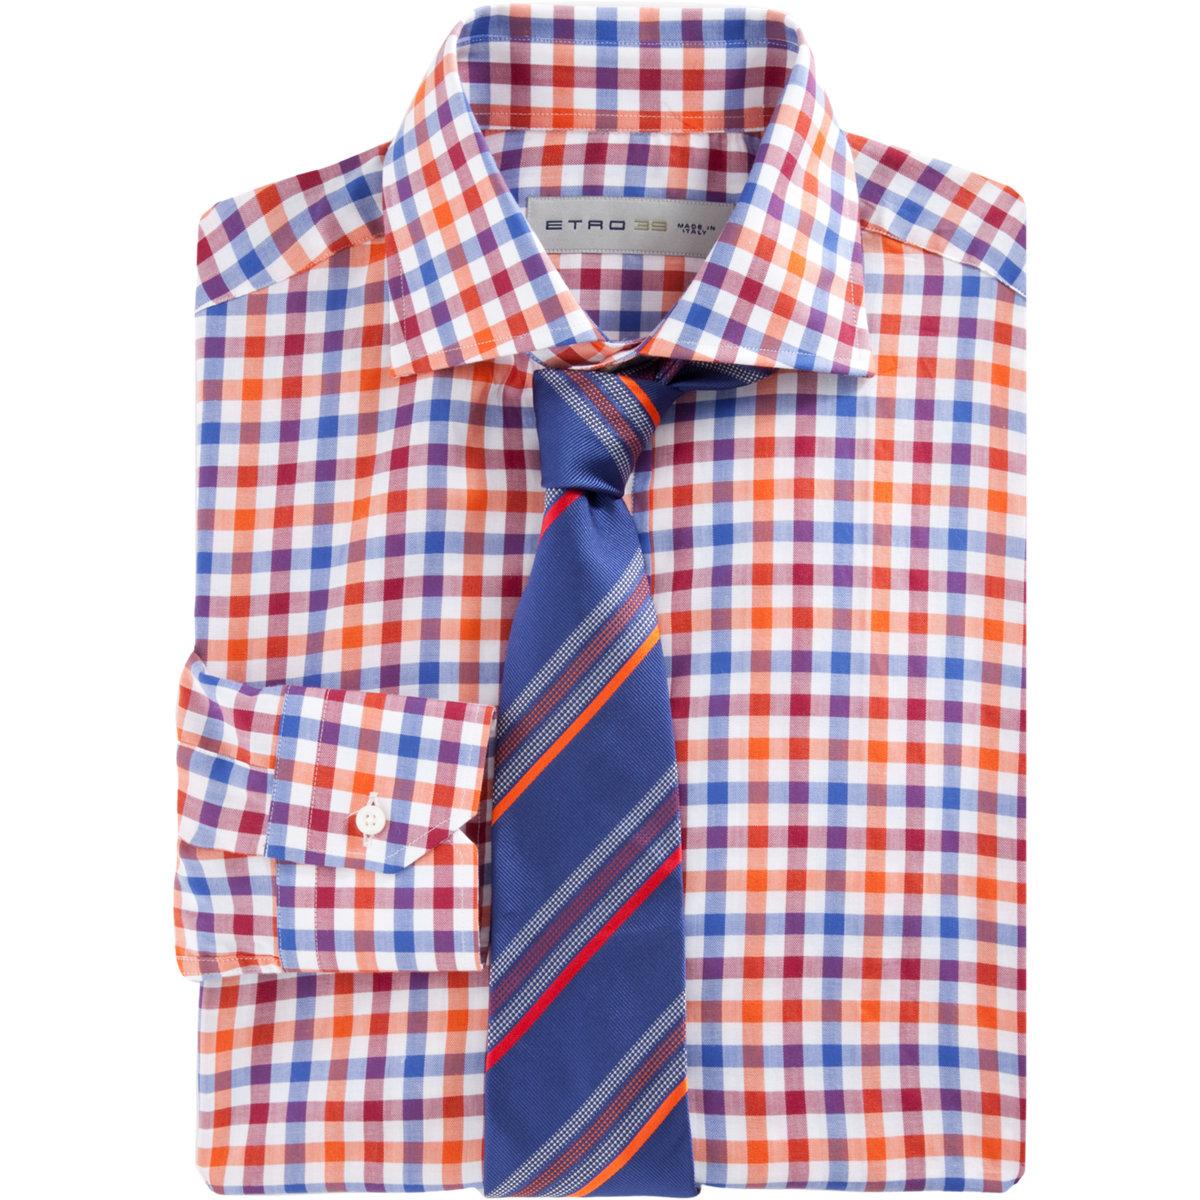 Etro Check Dress Shirt In Orange For Men Lyst